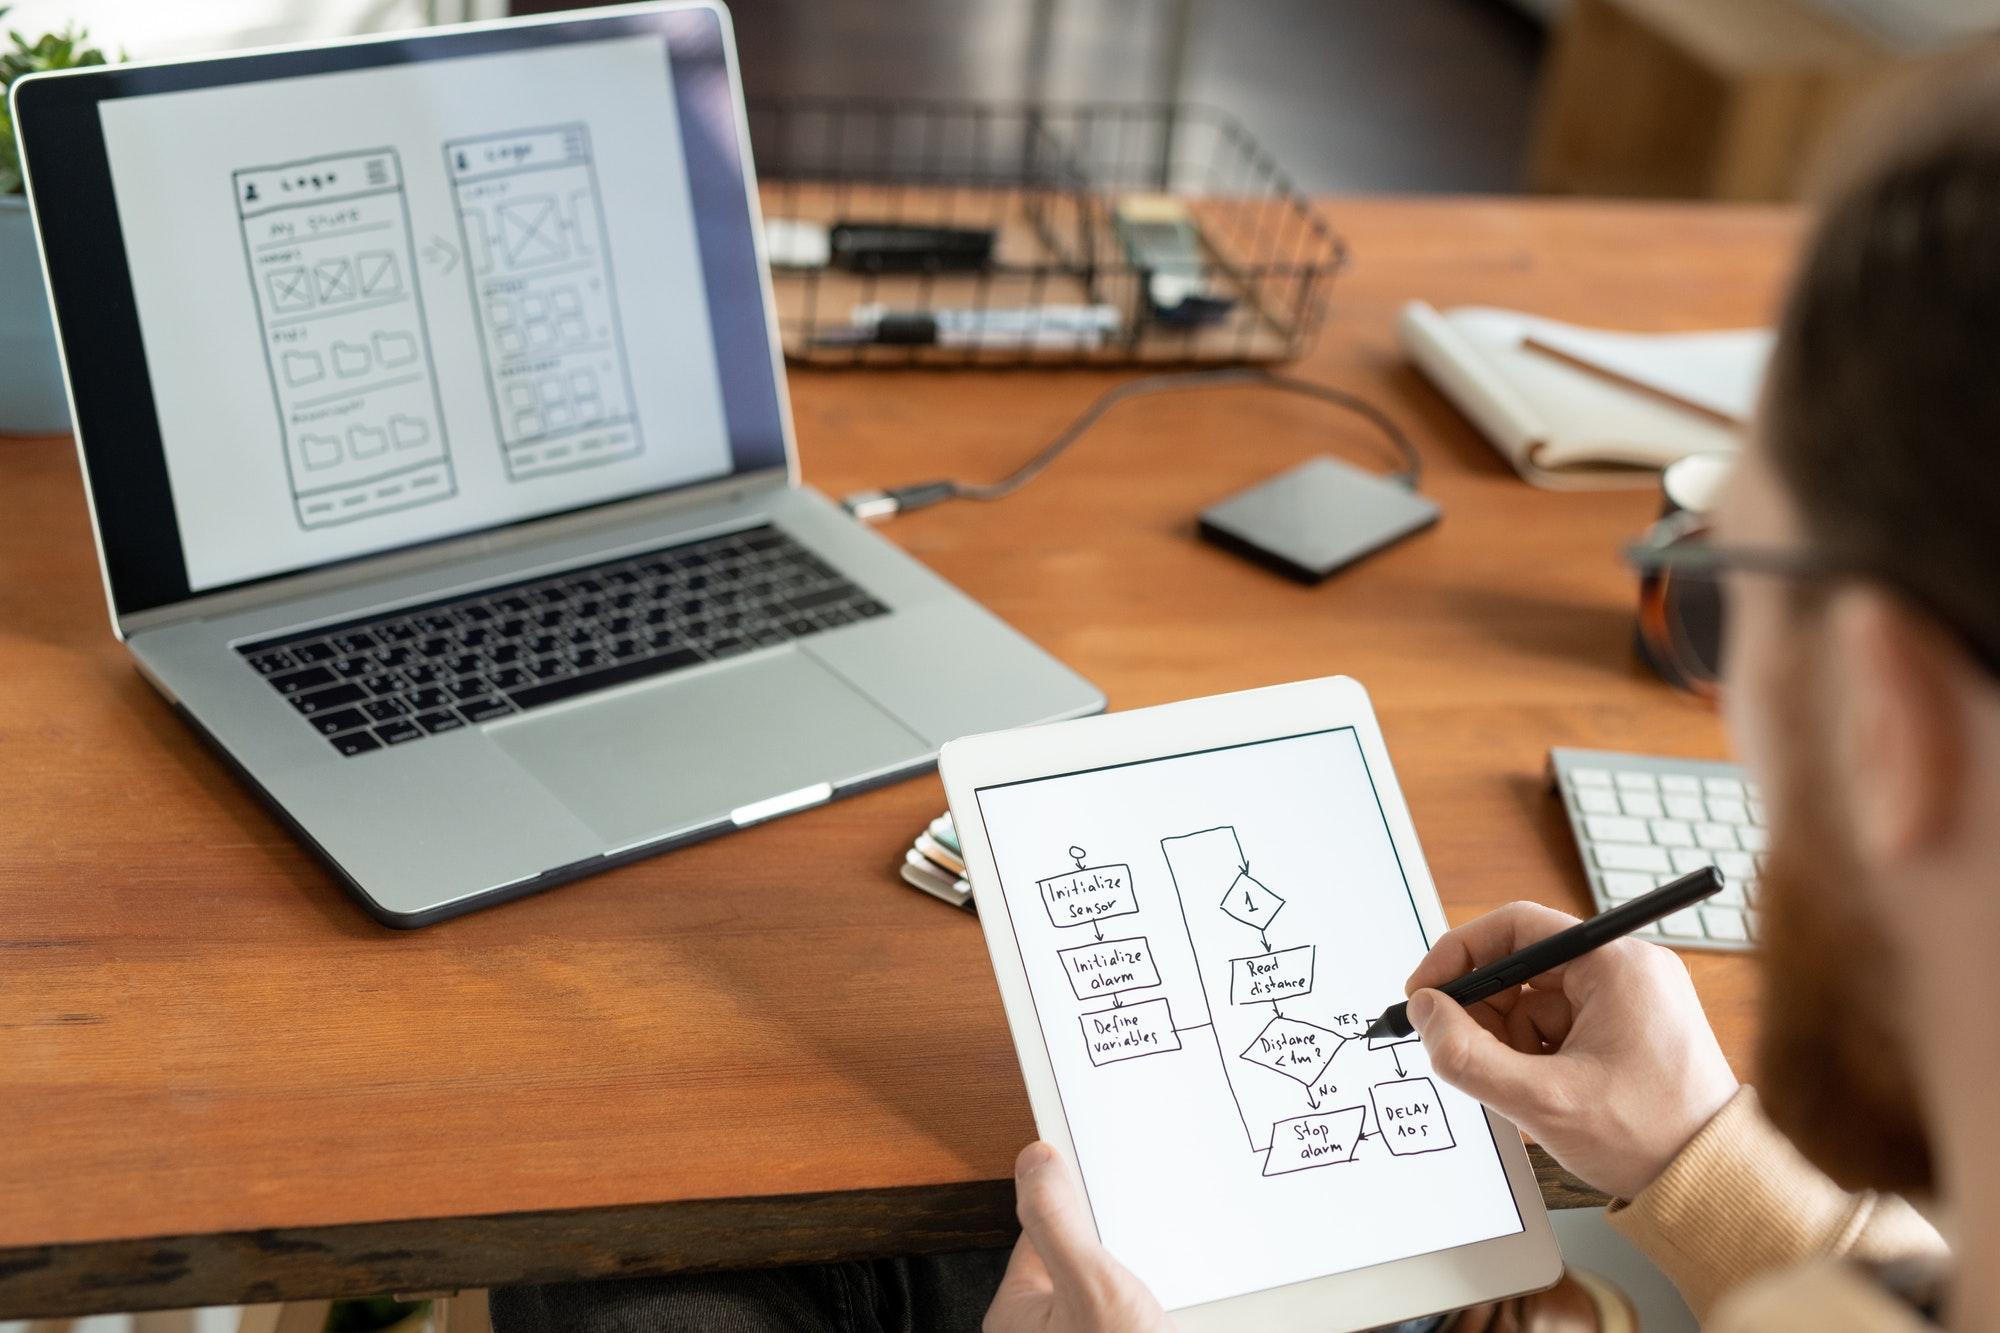 Drawing scheme for ui design